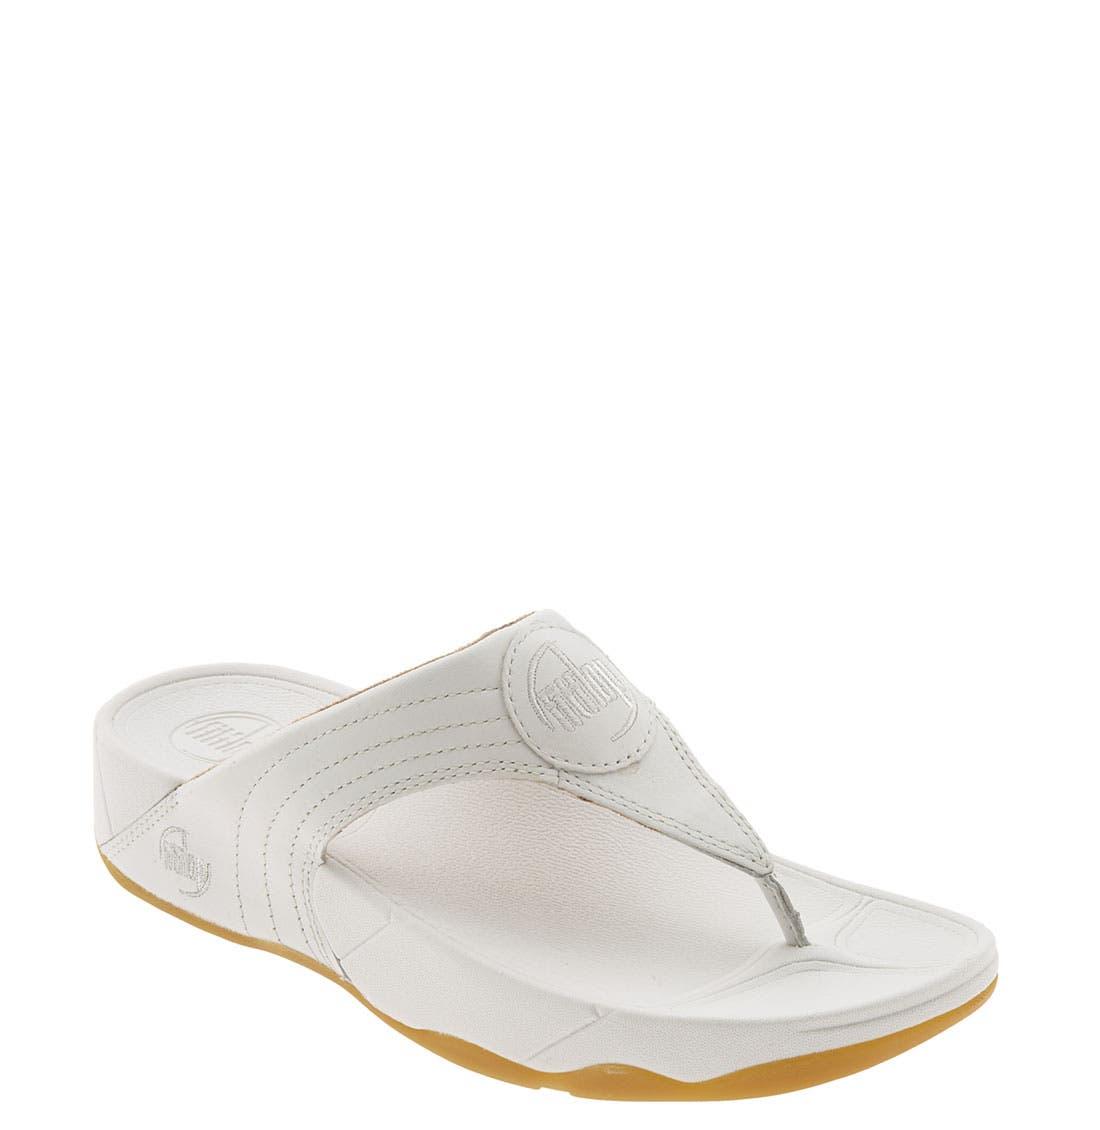 Alternate Image 1 Selected - FitFlop 'Walkstar III™' Sandal